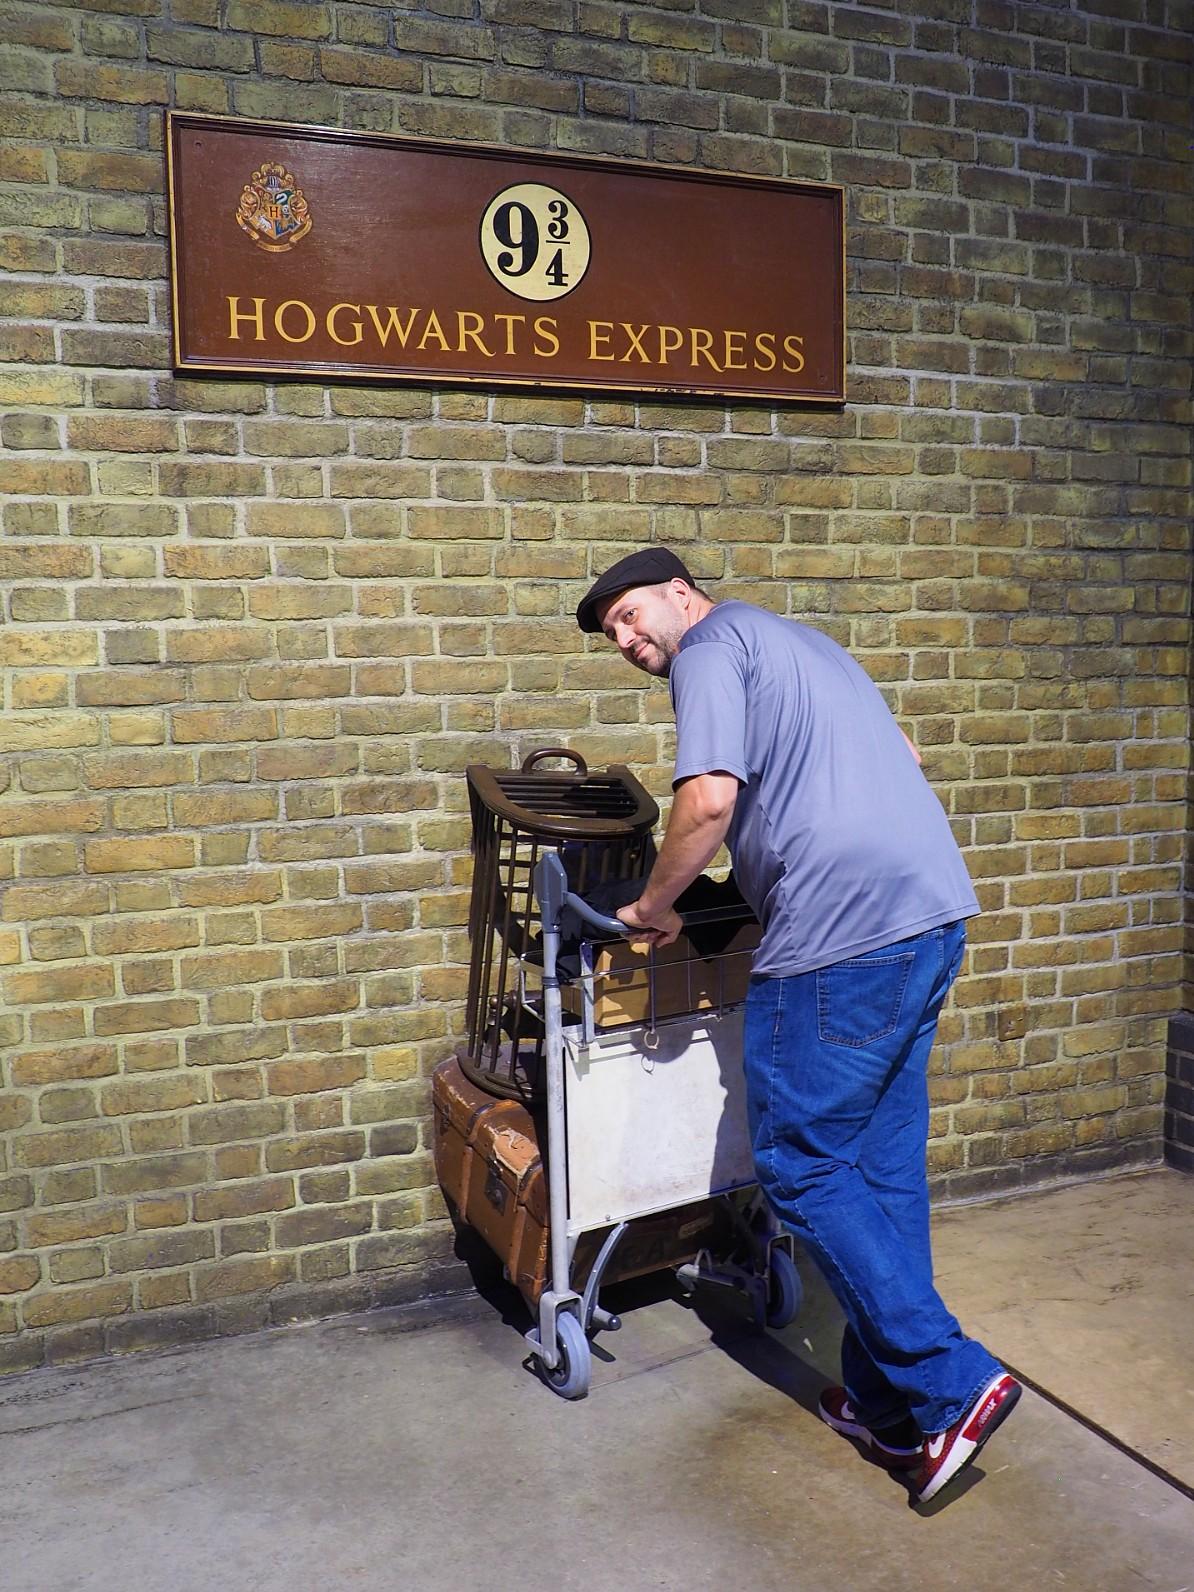 Harry Potter Studio Tour - Platform 2